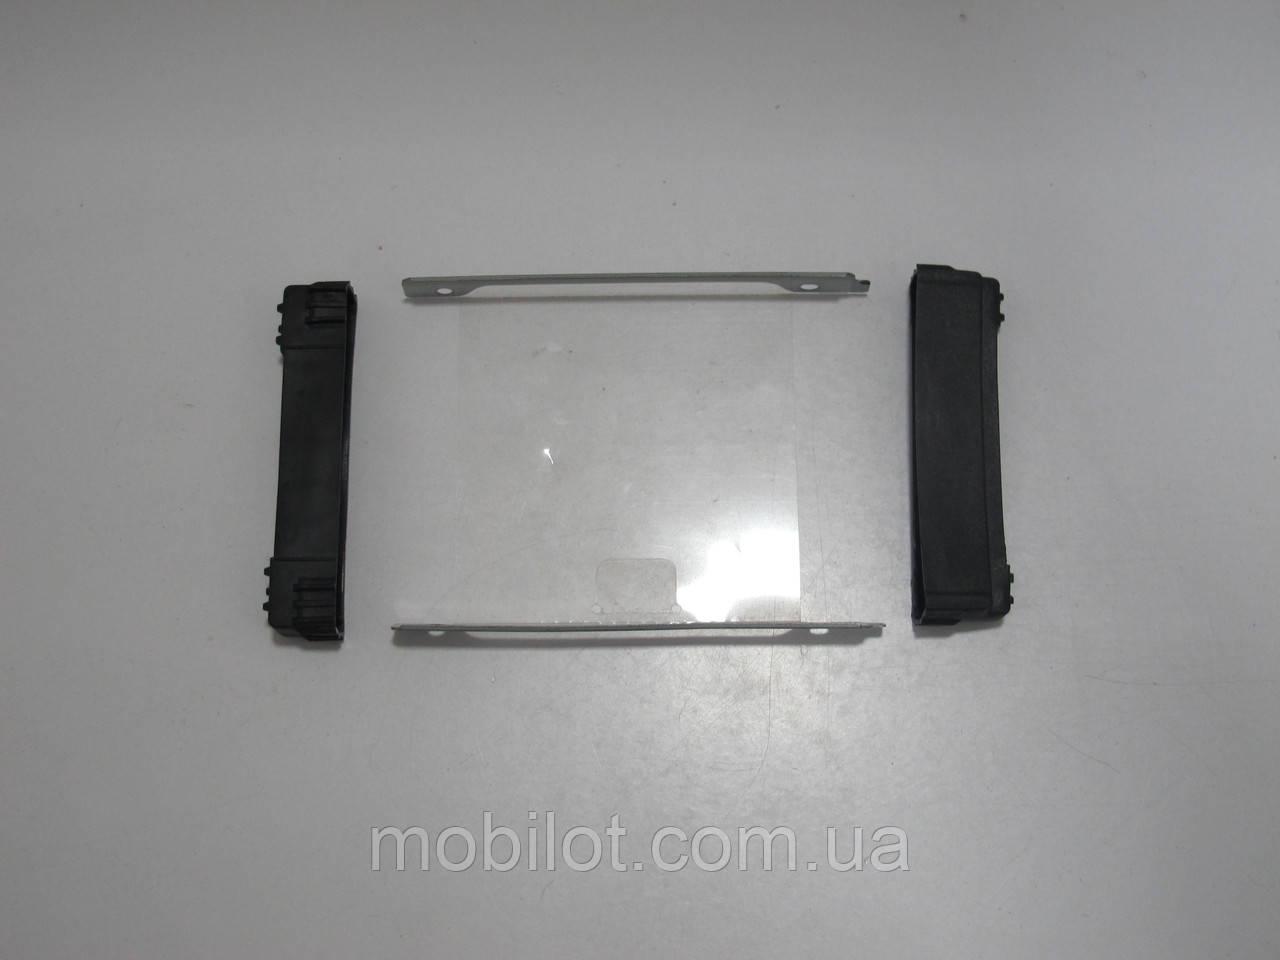 Корпус (карман, корзина, крепление) для HDD HP G7-2251sr (NZ-5430)&nbs